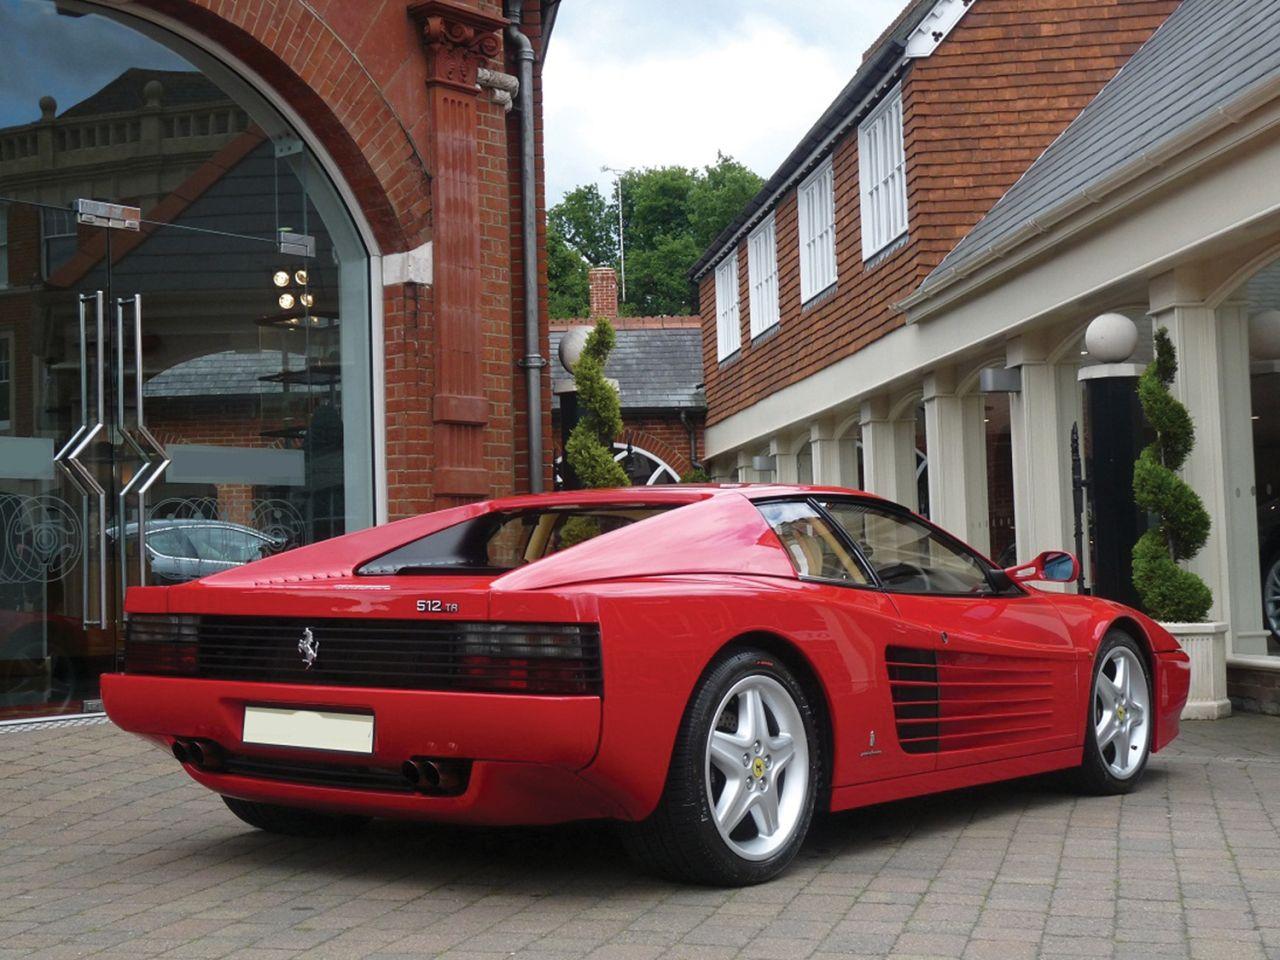 Ferrari-512-Testarossa-Elton-John-01.jpg